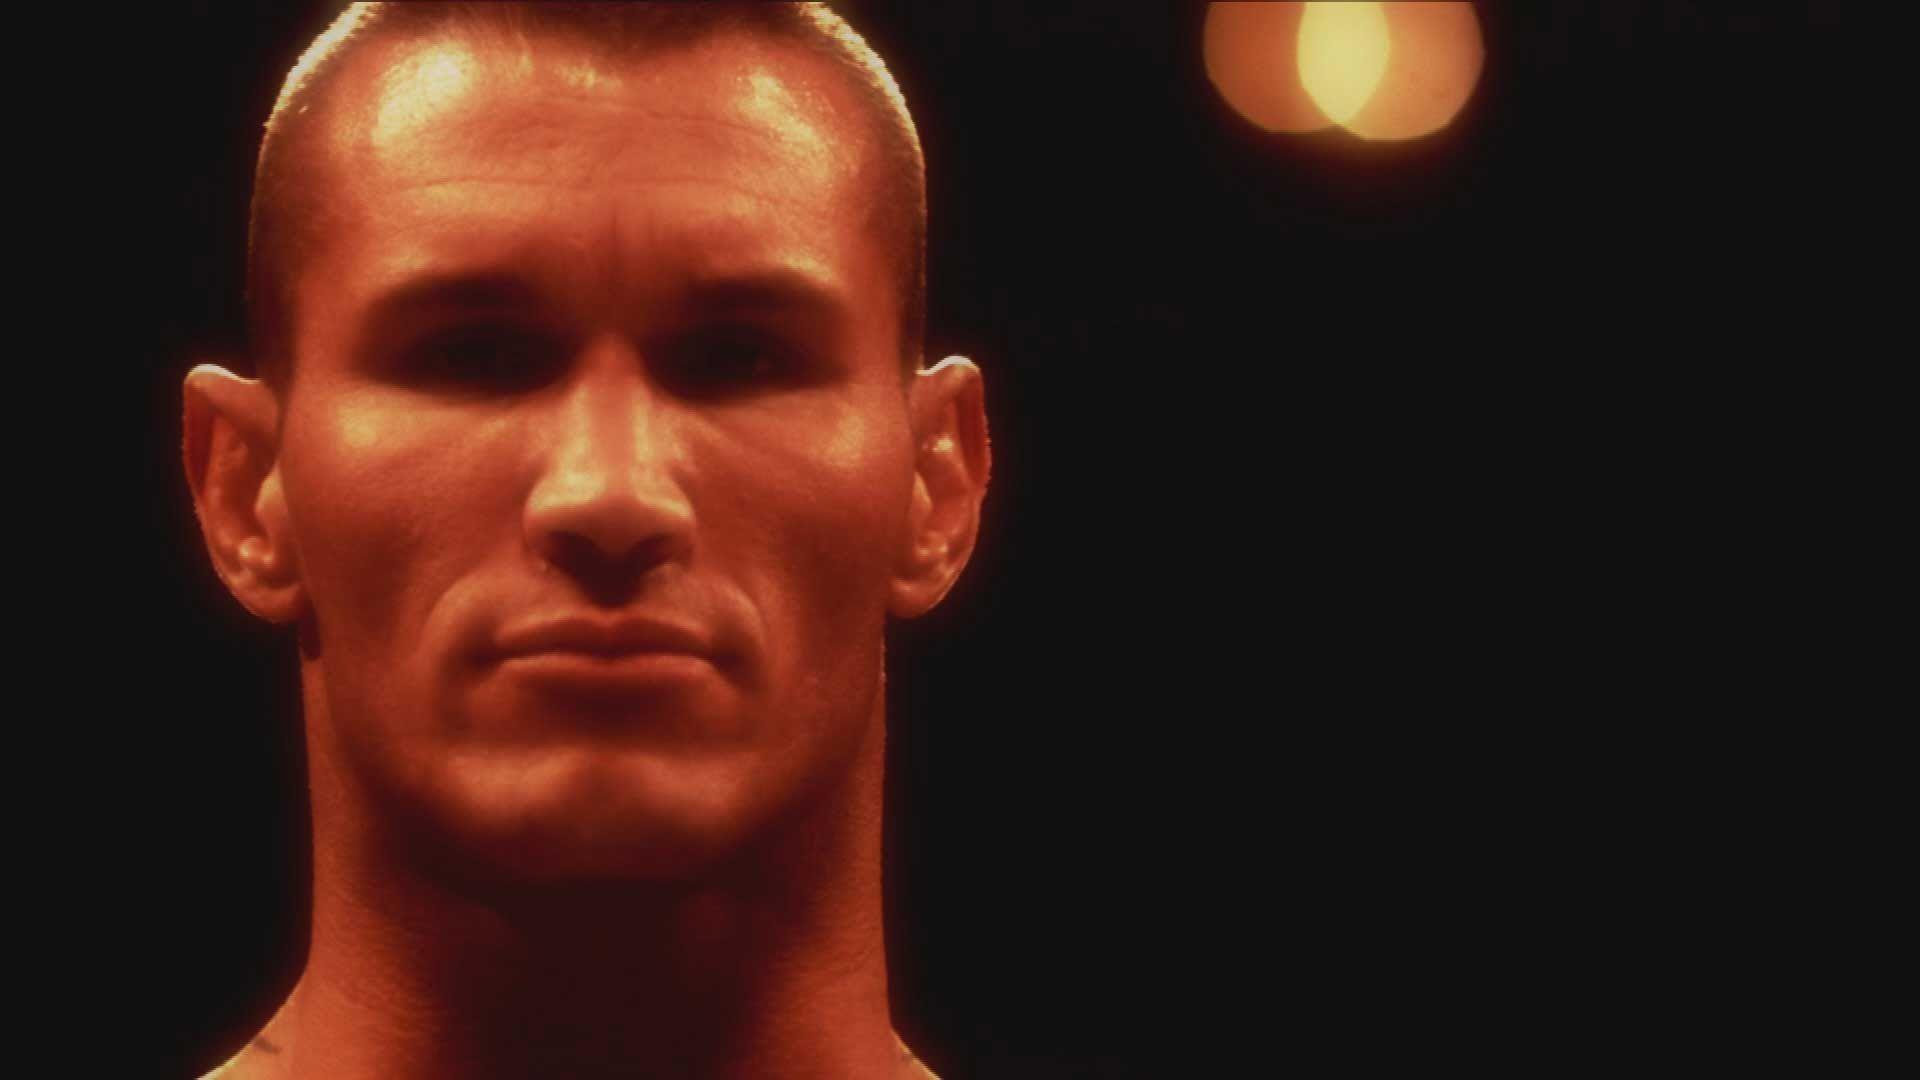 HD WWE Randy Orton Smiley Faces Wallpaper 2018 ·① WallpaperTag